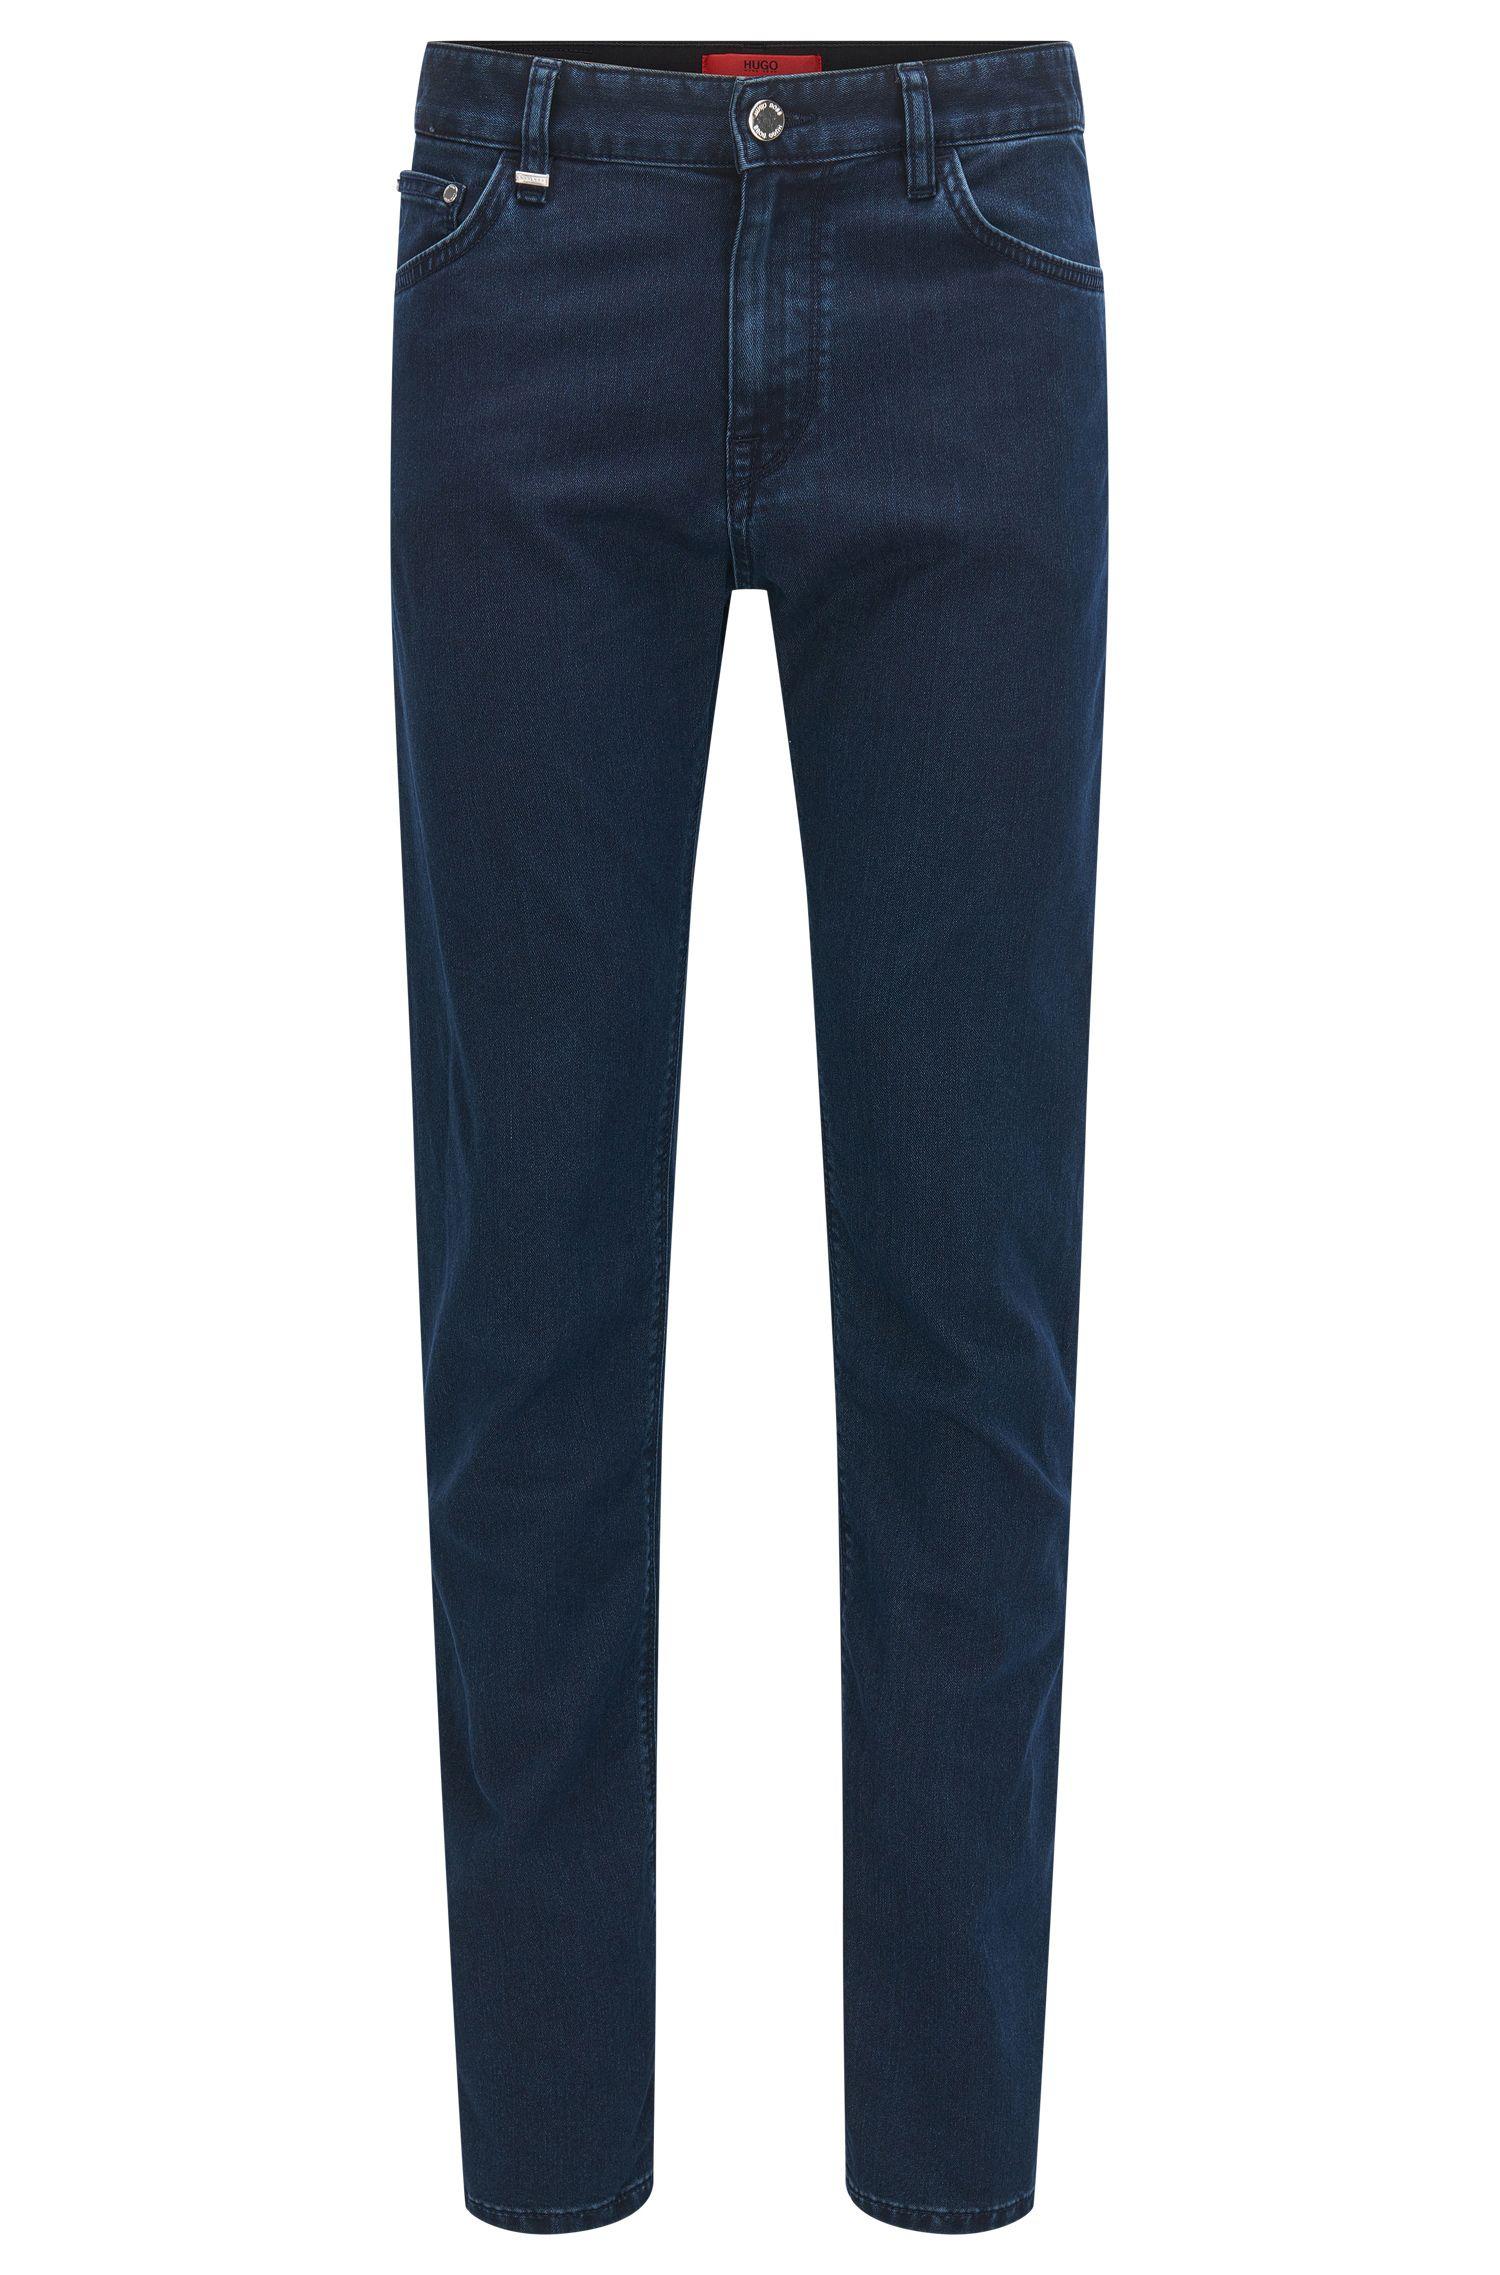 Jeans regular fit elasticizzati in raffinato denim italiano